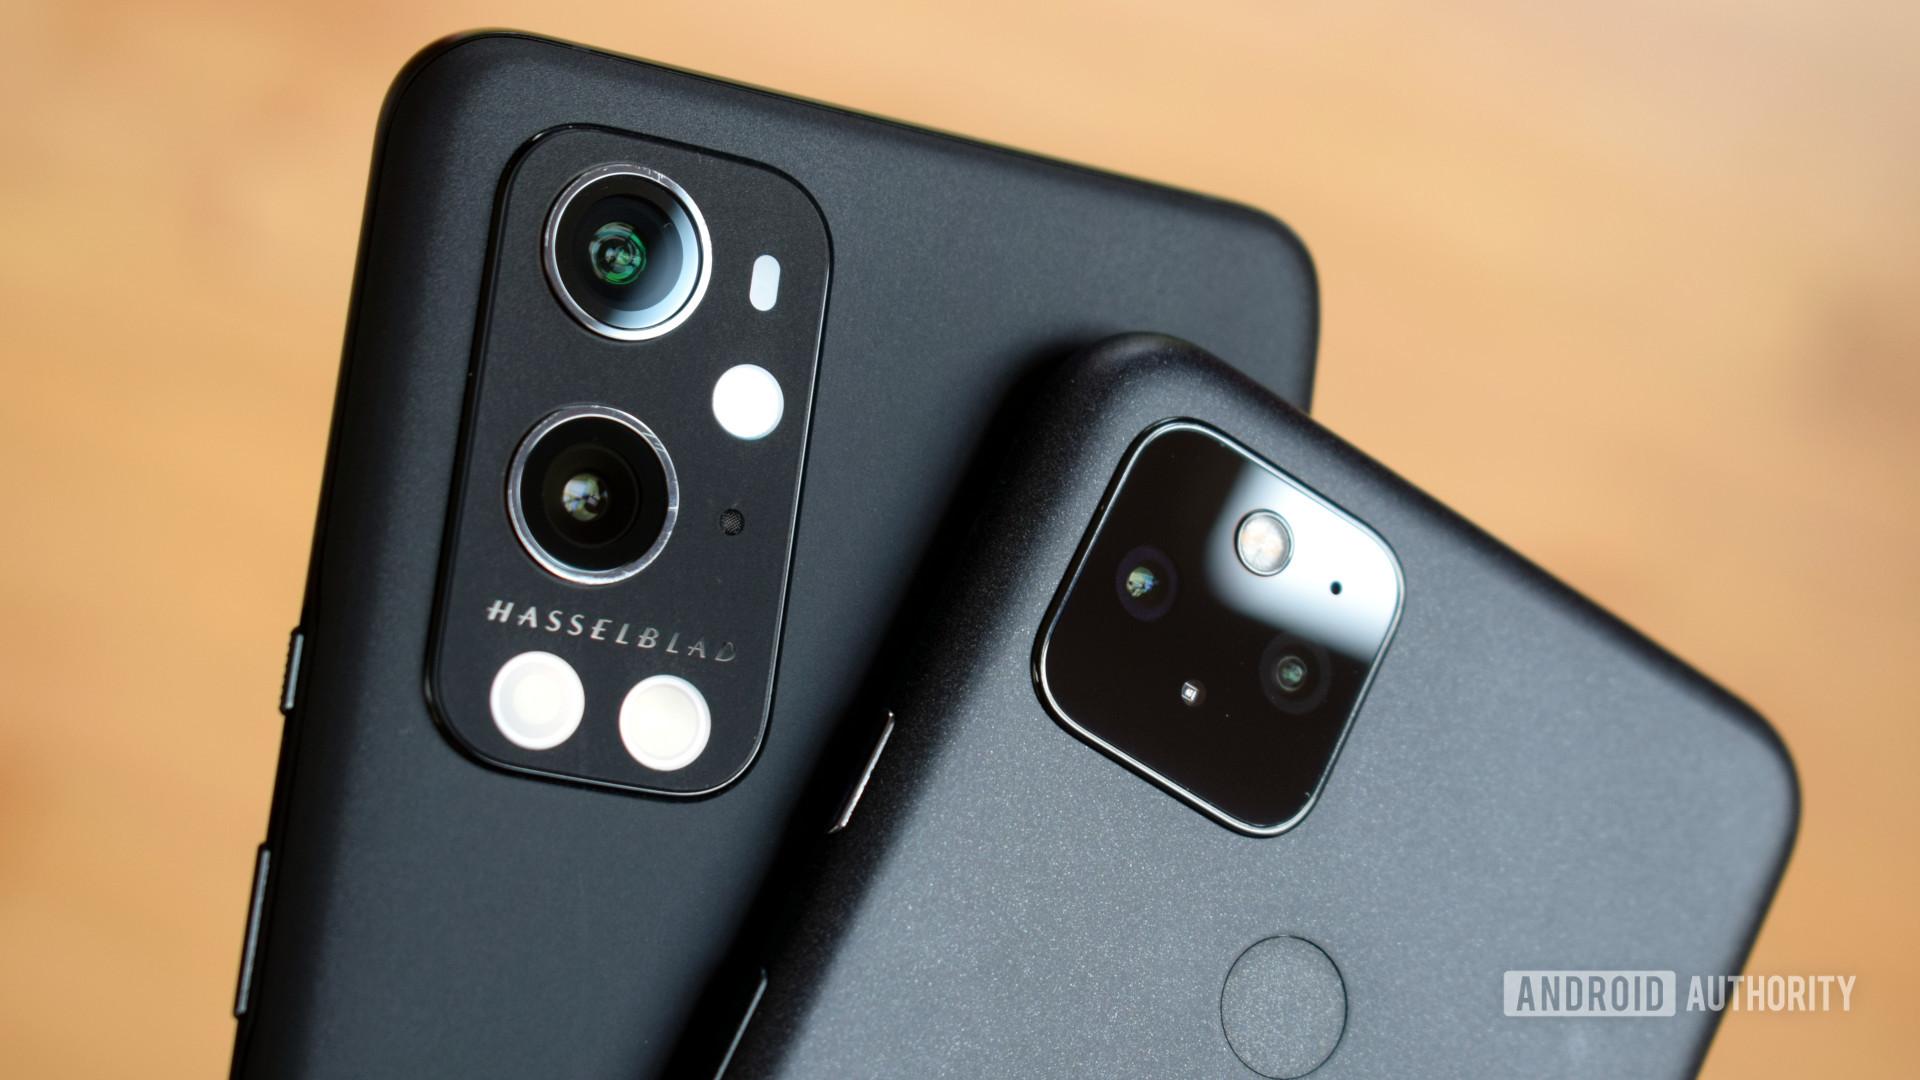 Google Pixel 5 vs OnePlus 9 Pro cameras